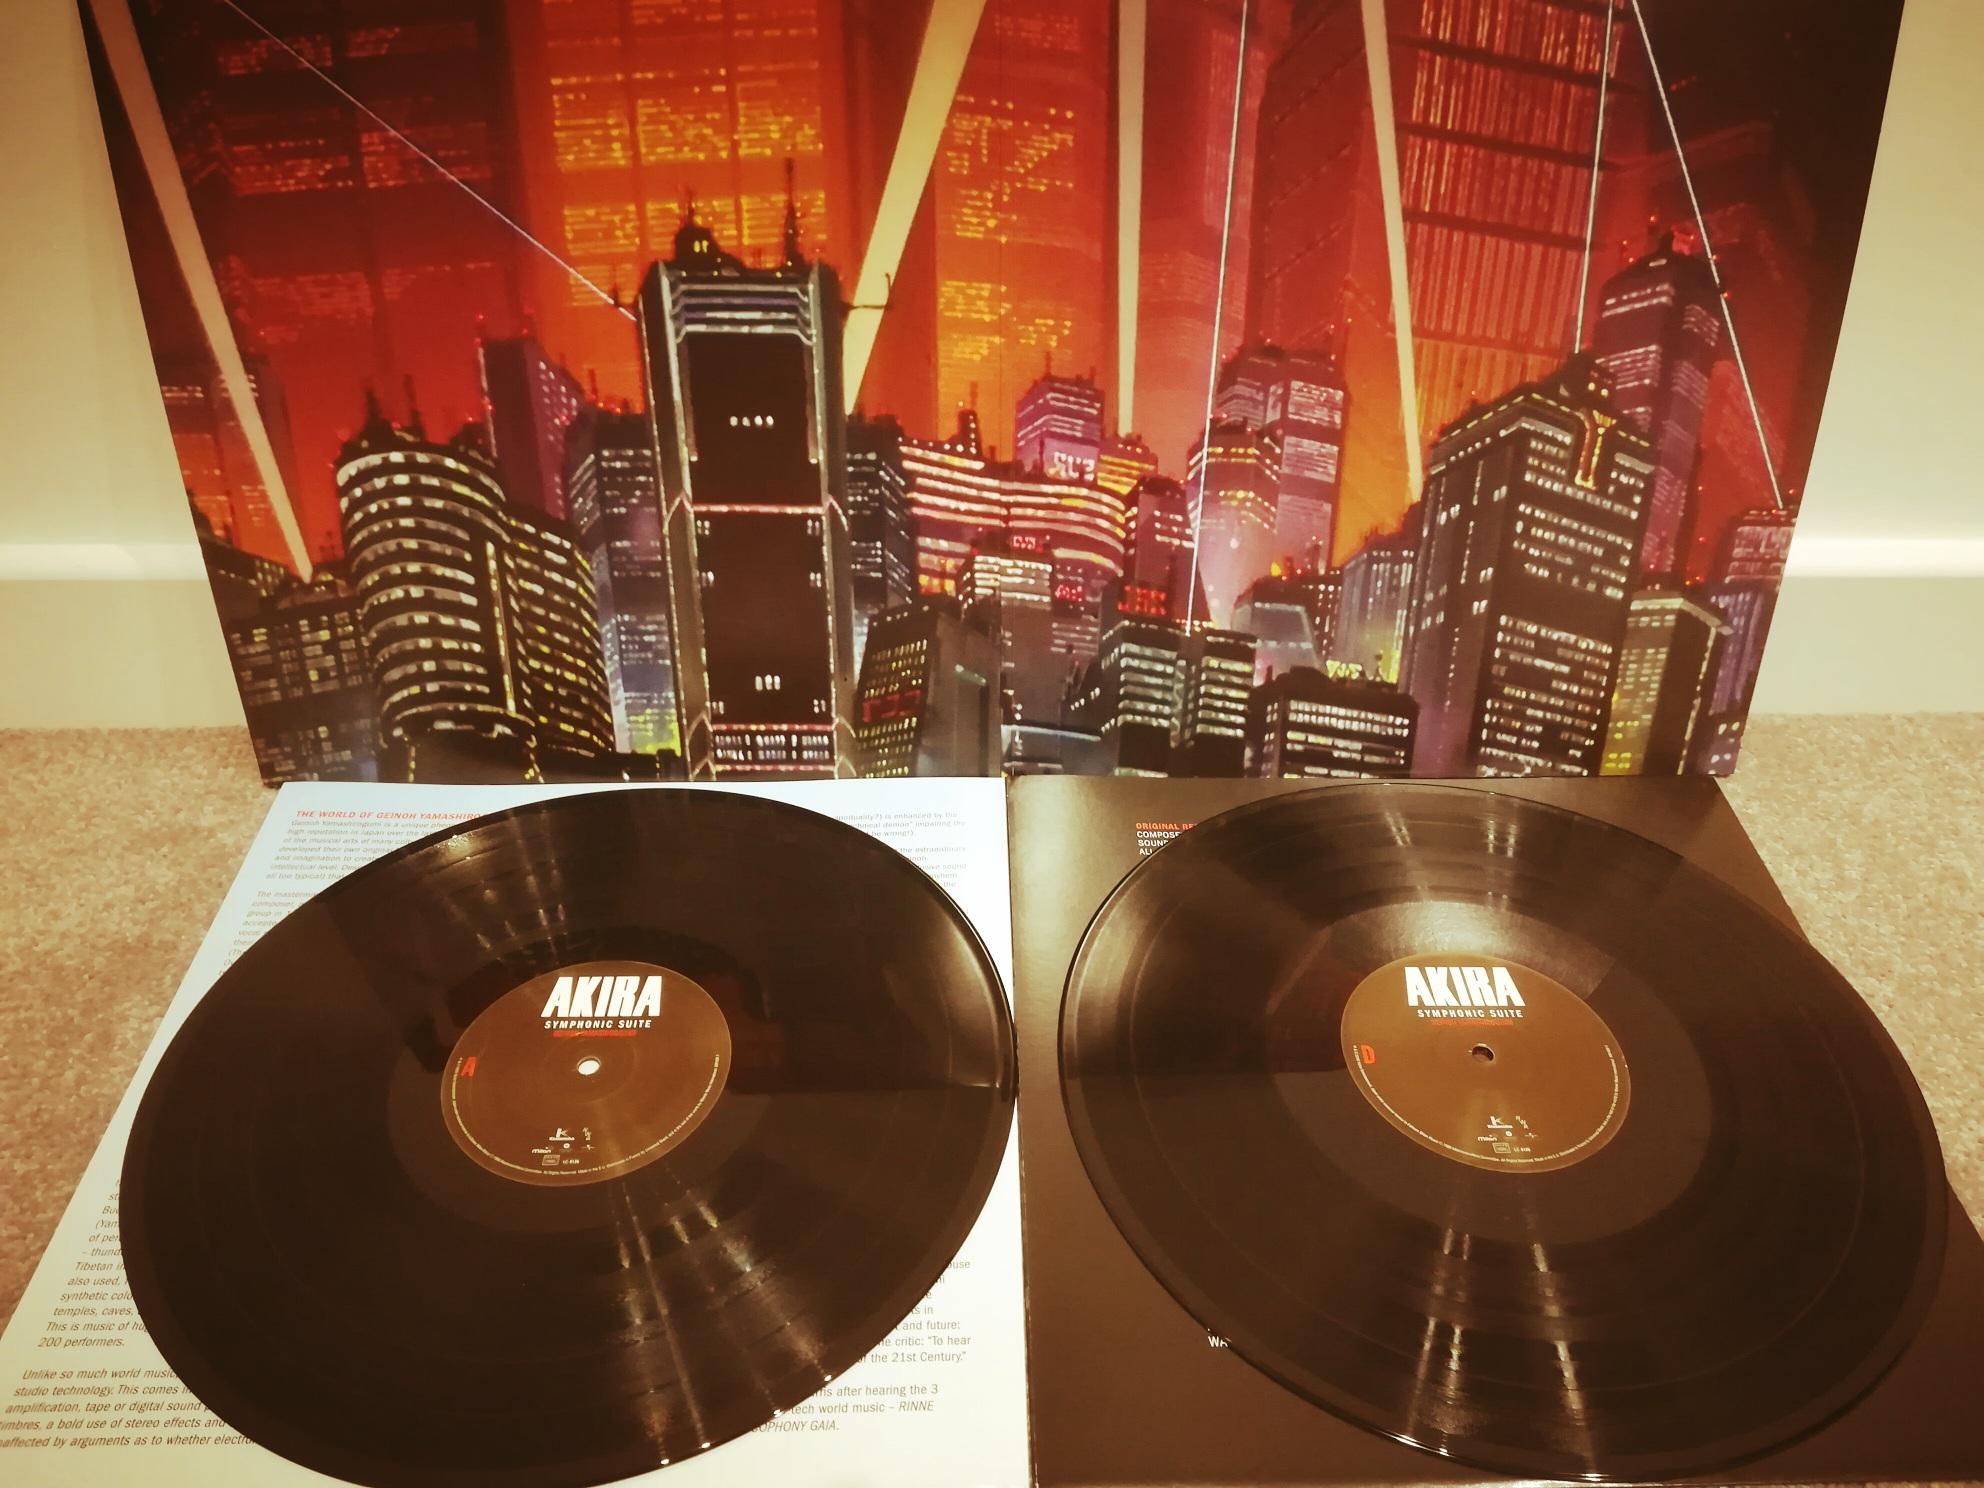 Akira Soundtrack Vinyl